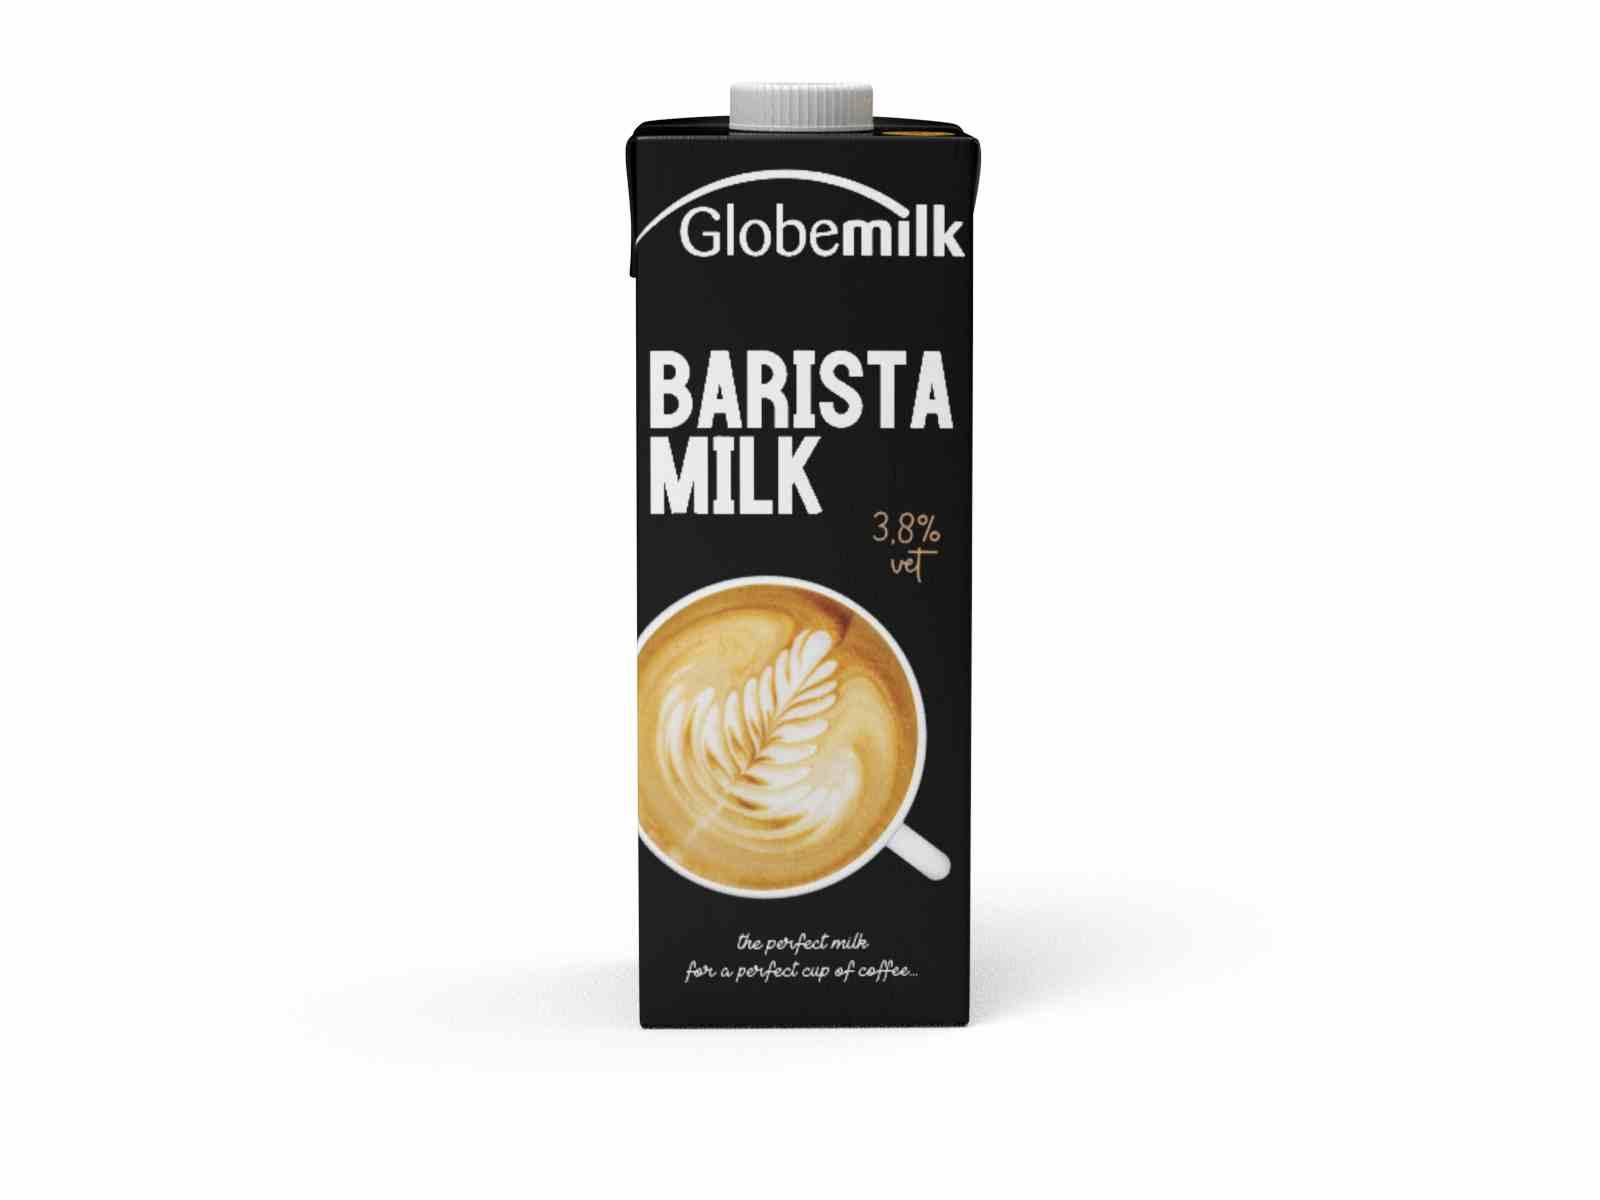 Barista milk 3,8% vet 6x1l